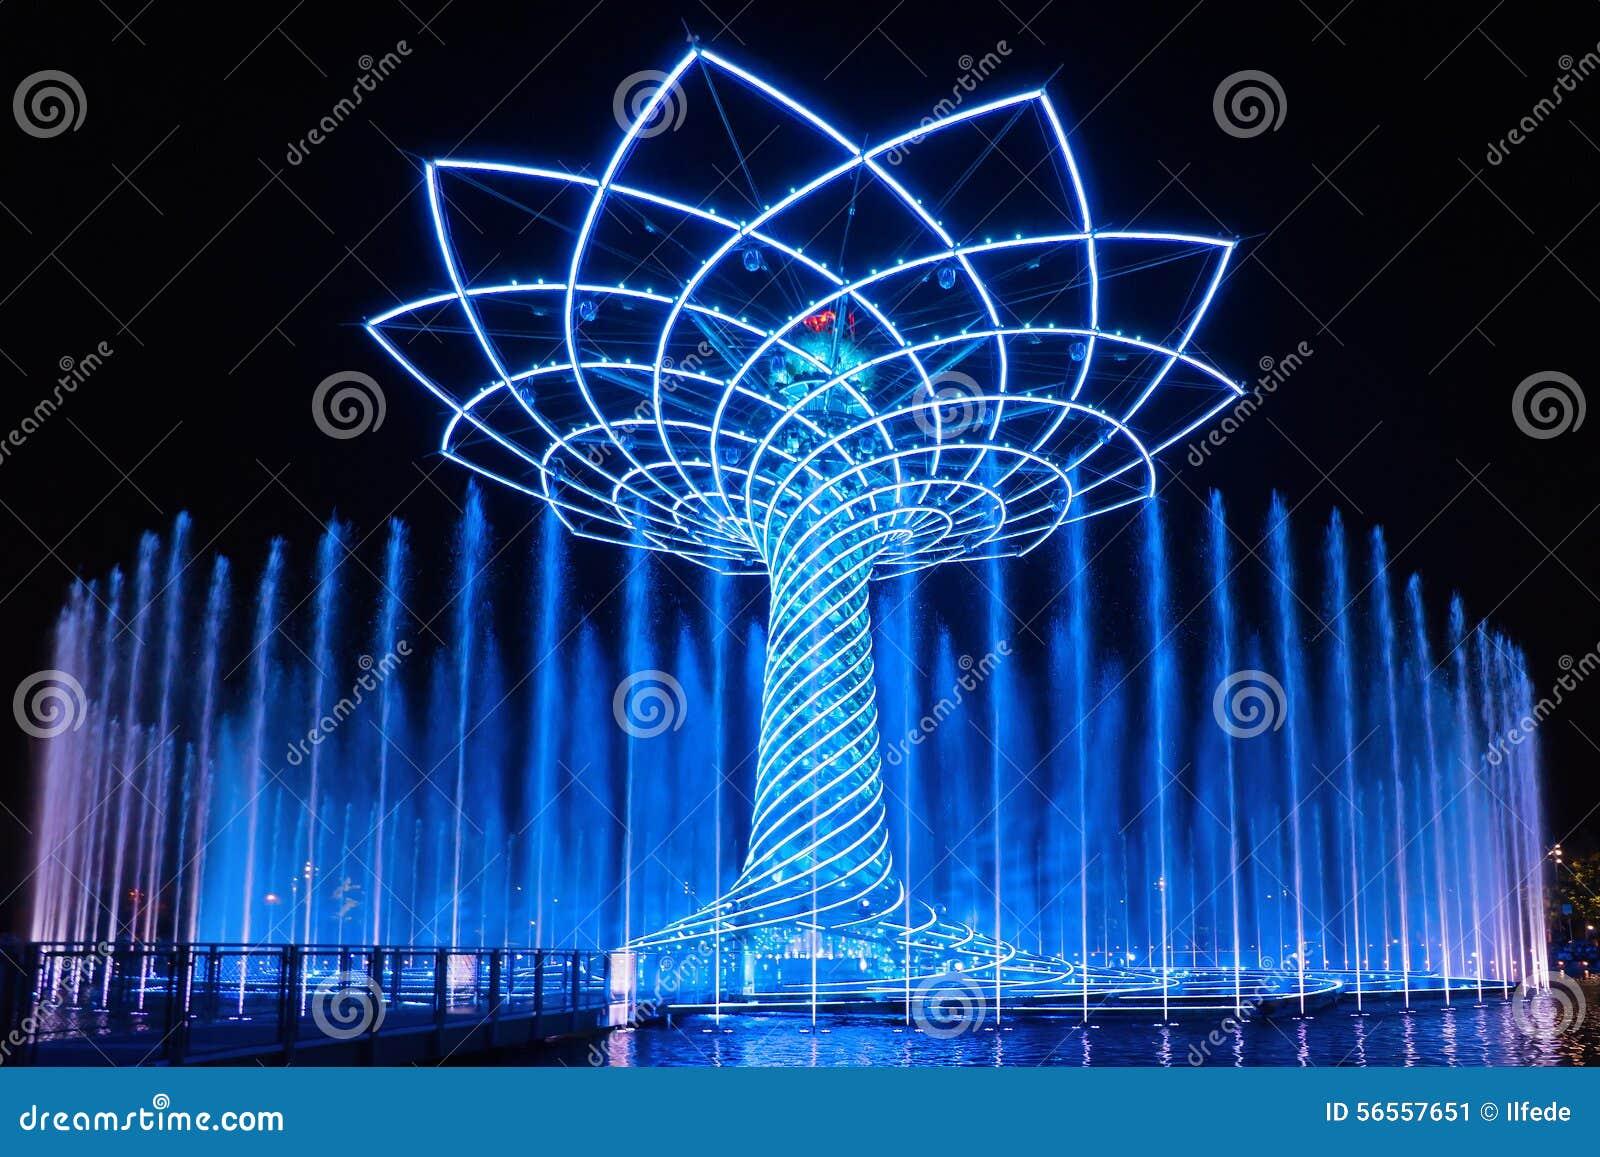 Download Το δέντρο νύχτας της ζωής (vita Della Albero) παρουσιάζει Το δέντρο της ζωής είναι το σύμβολο EXPO το 2015 Εκδοτική Εικόνες - εικόνα από εμφανίστε, ιταλία: 56557651